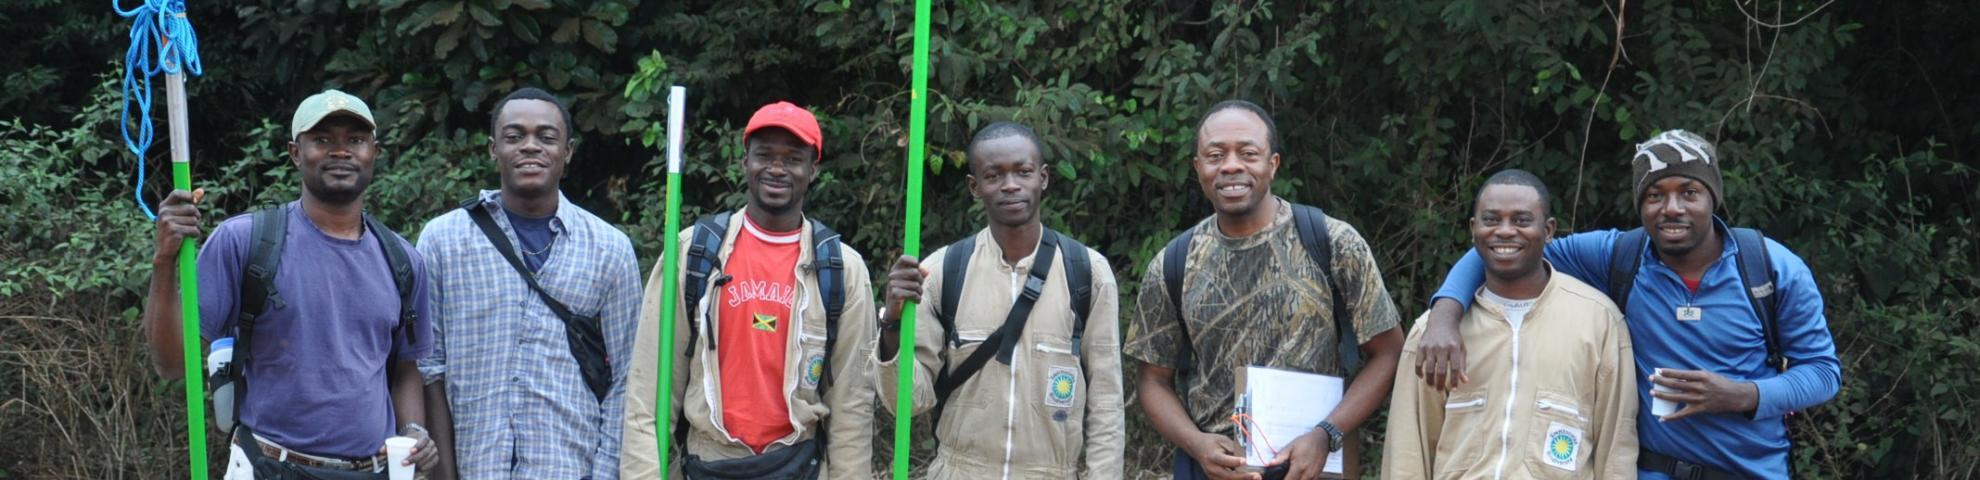 Rabi field crew